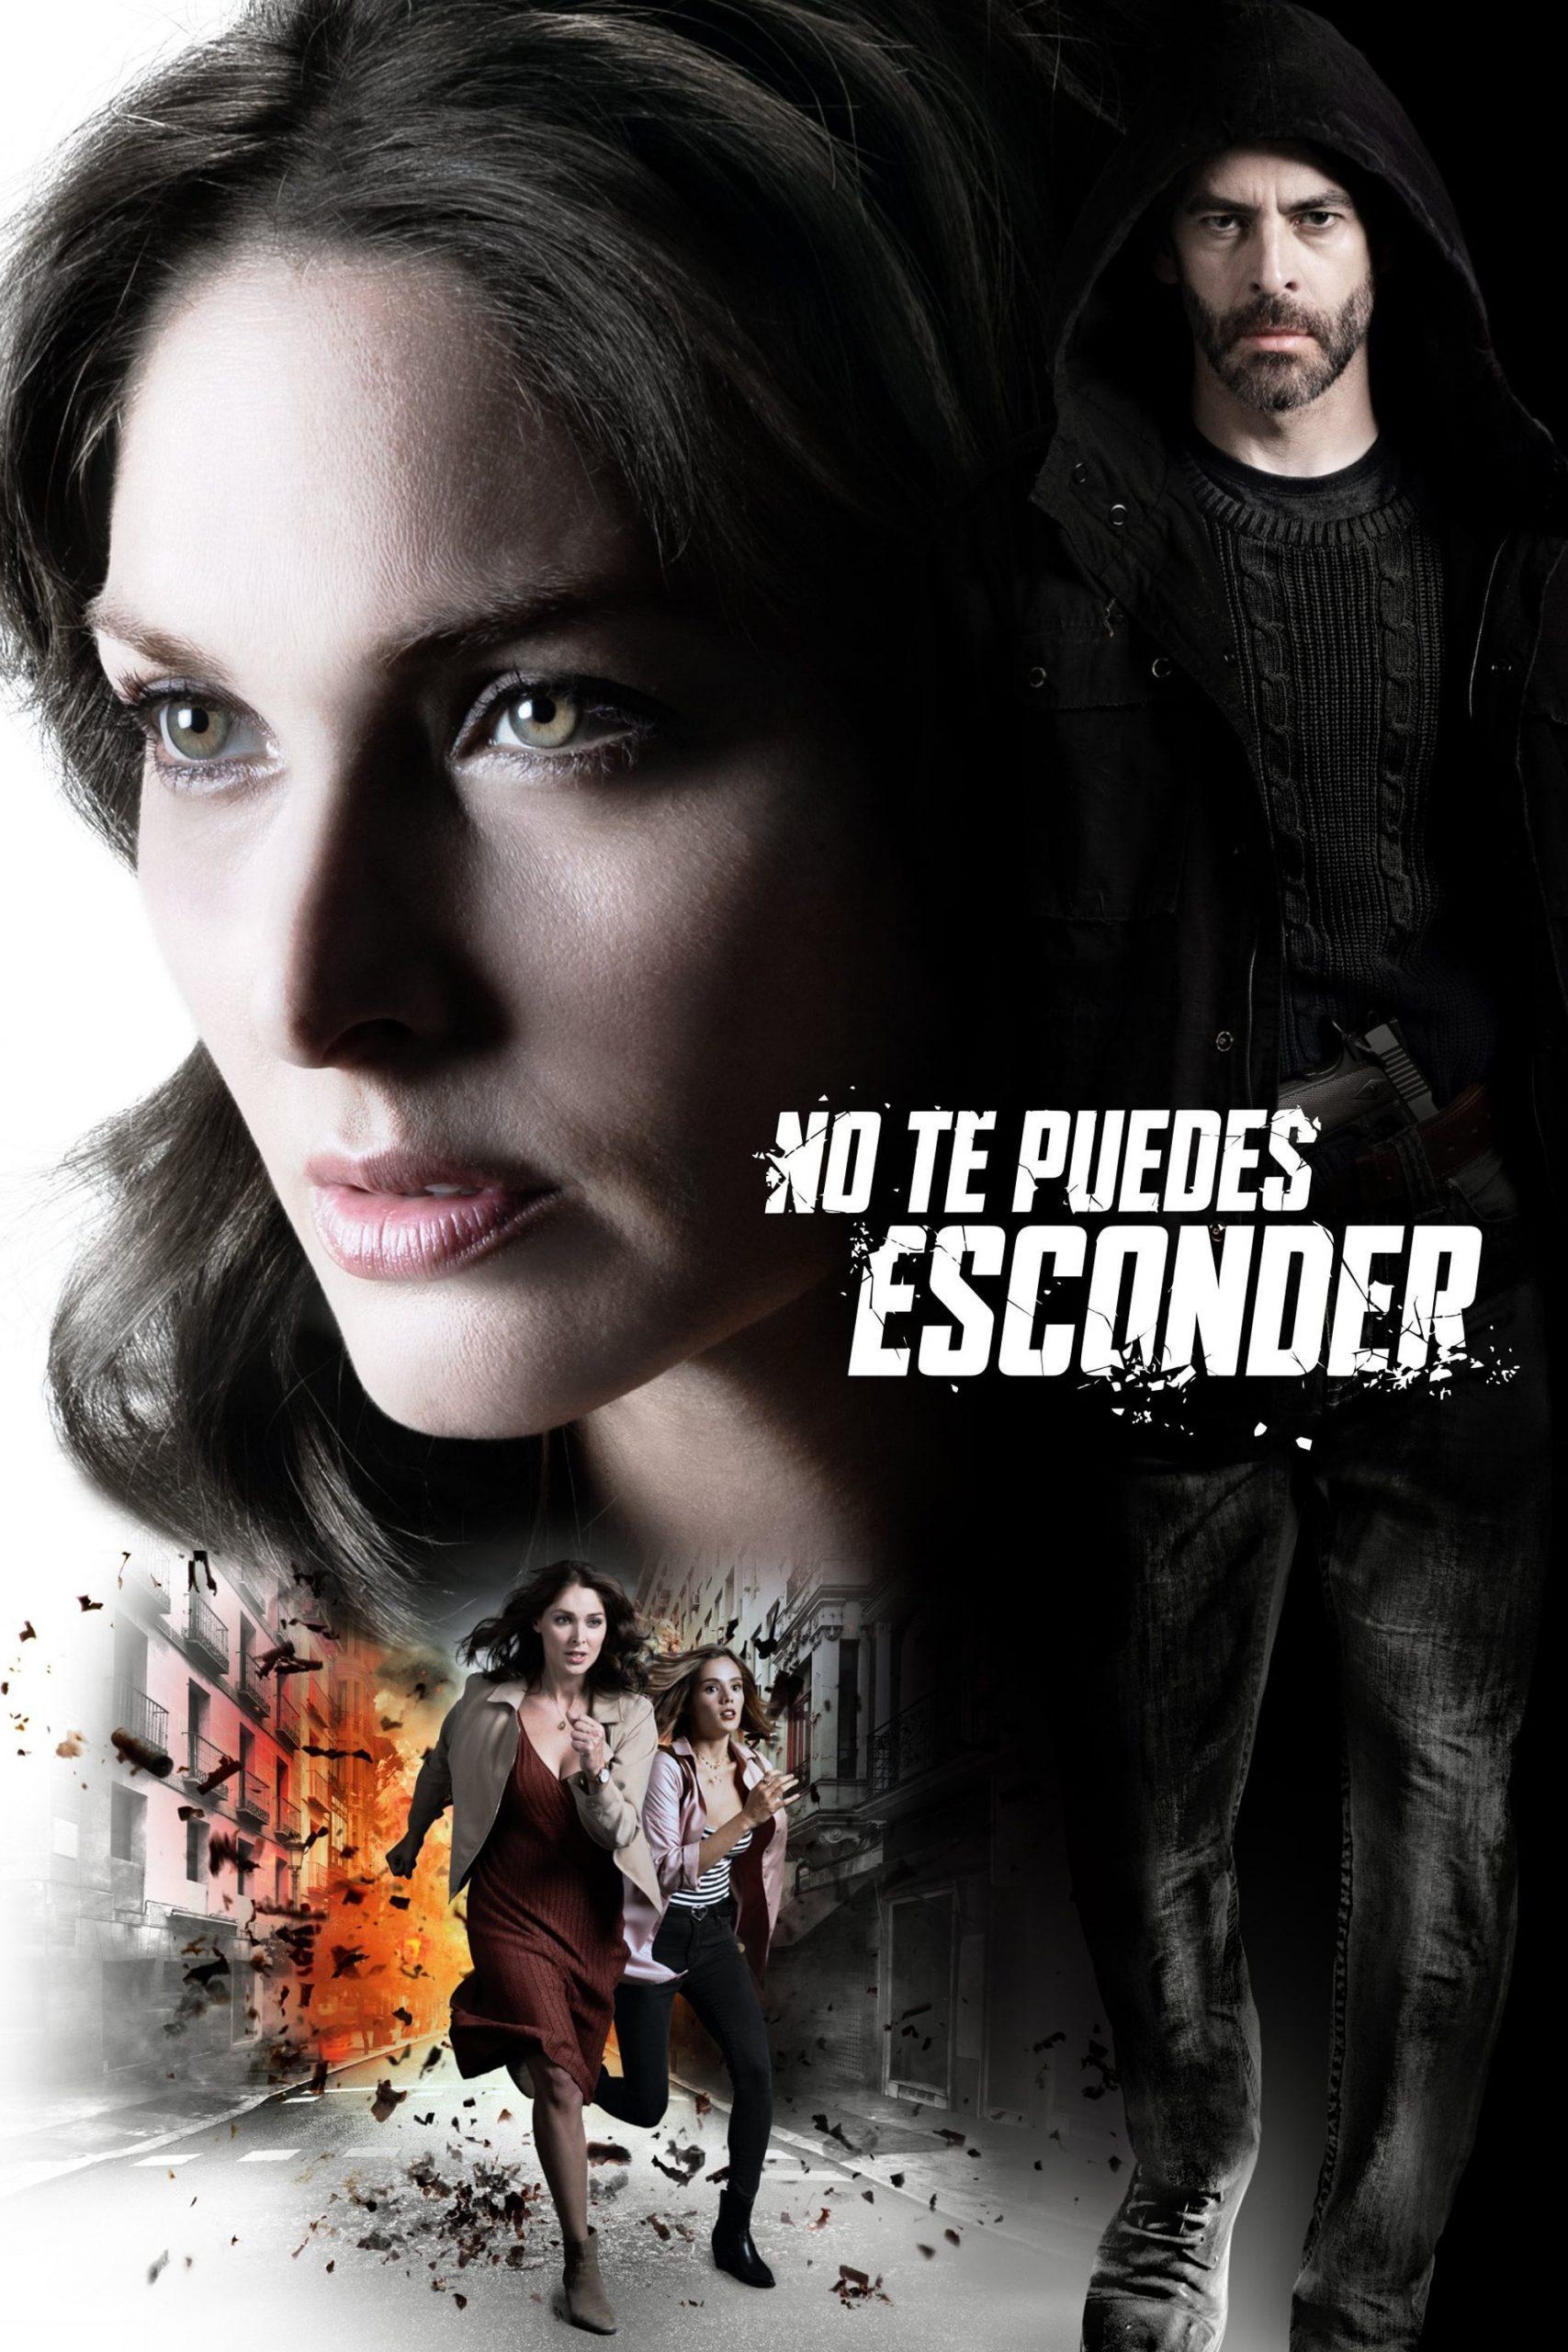 Image murder-24658-episode-7-season-1.jpg